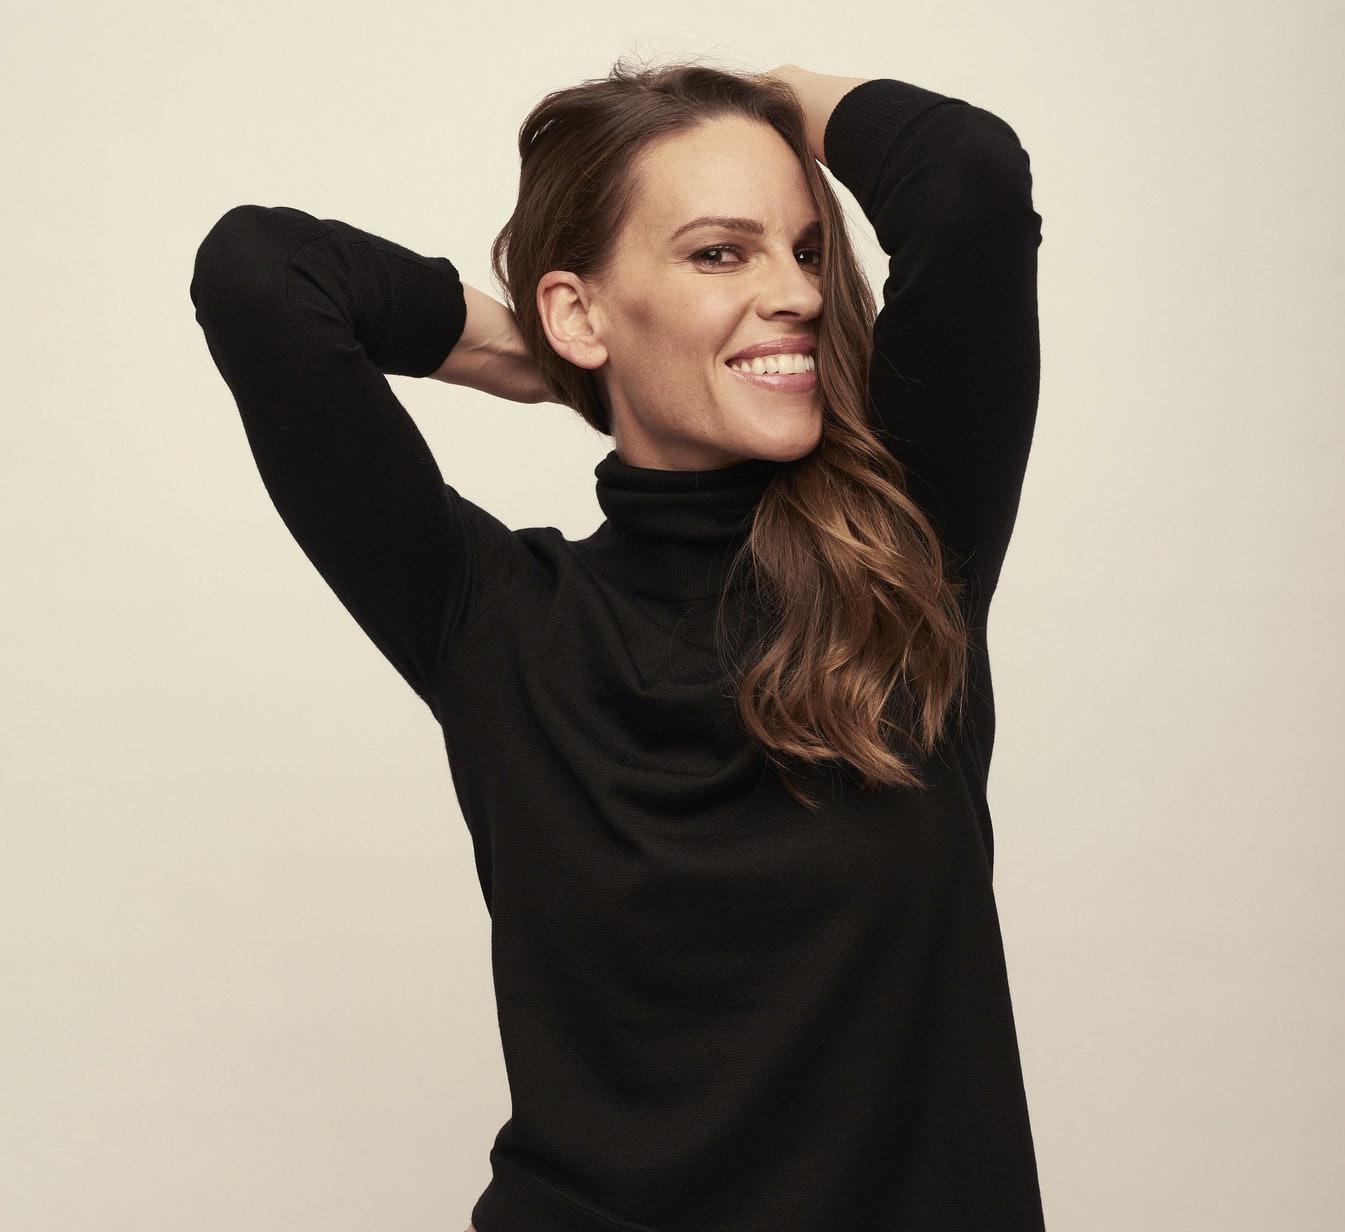 Video Ildiko Ferenczi nude photos 2019